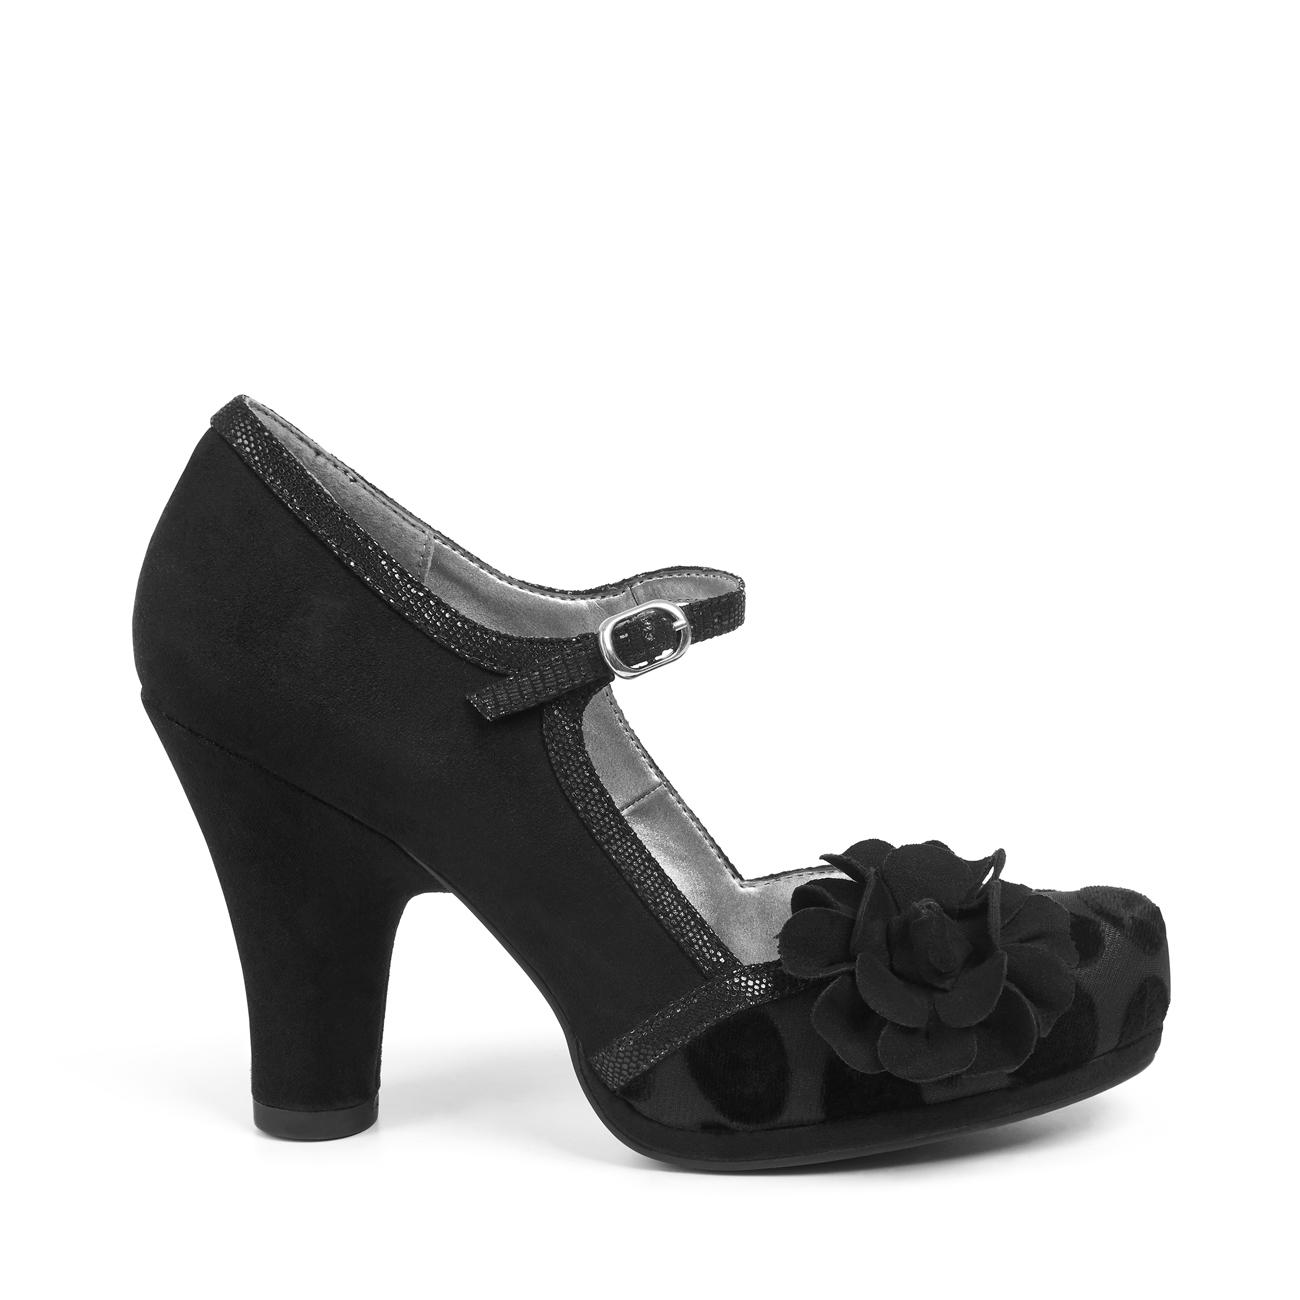 Spot Ruby Black Matching 3 9 Tortola amp; Shoo Bar Navy Hannah Shoes Uk Bag Olive r7qwr6T